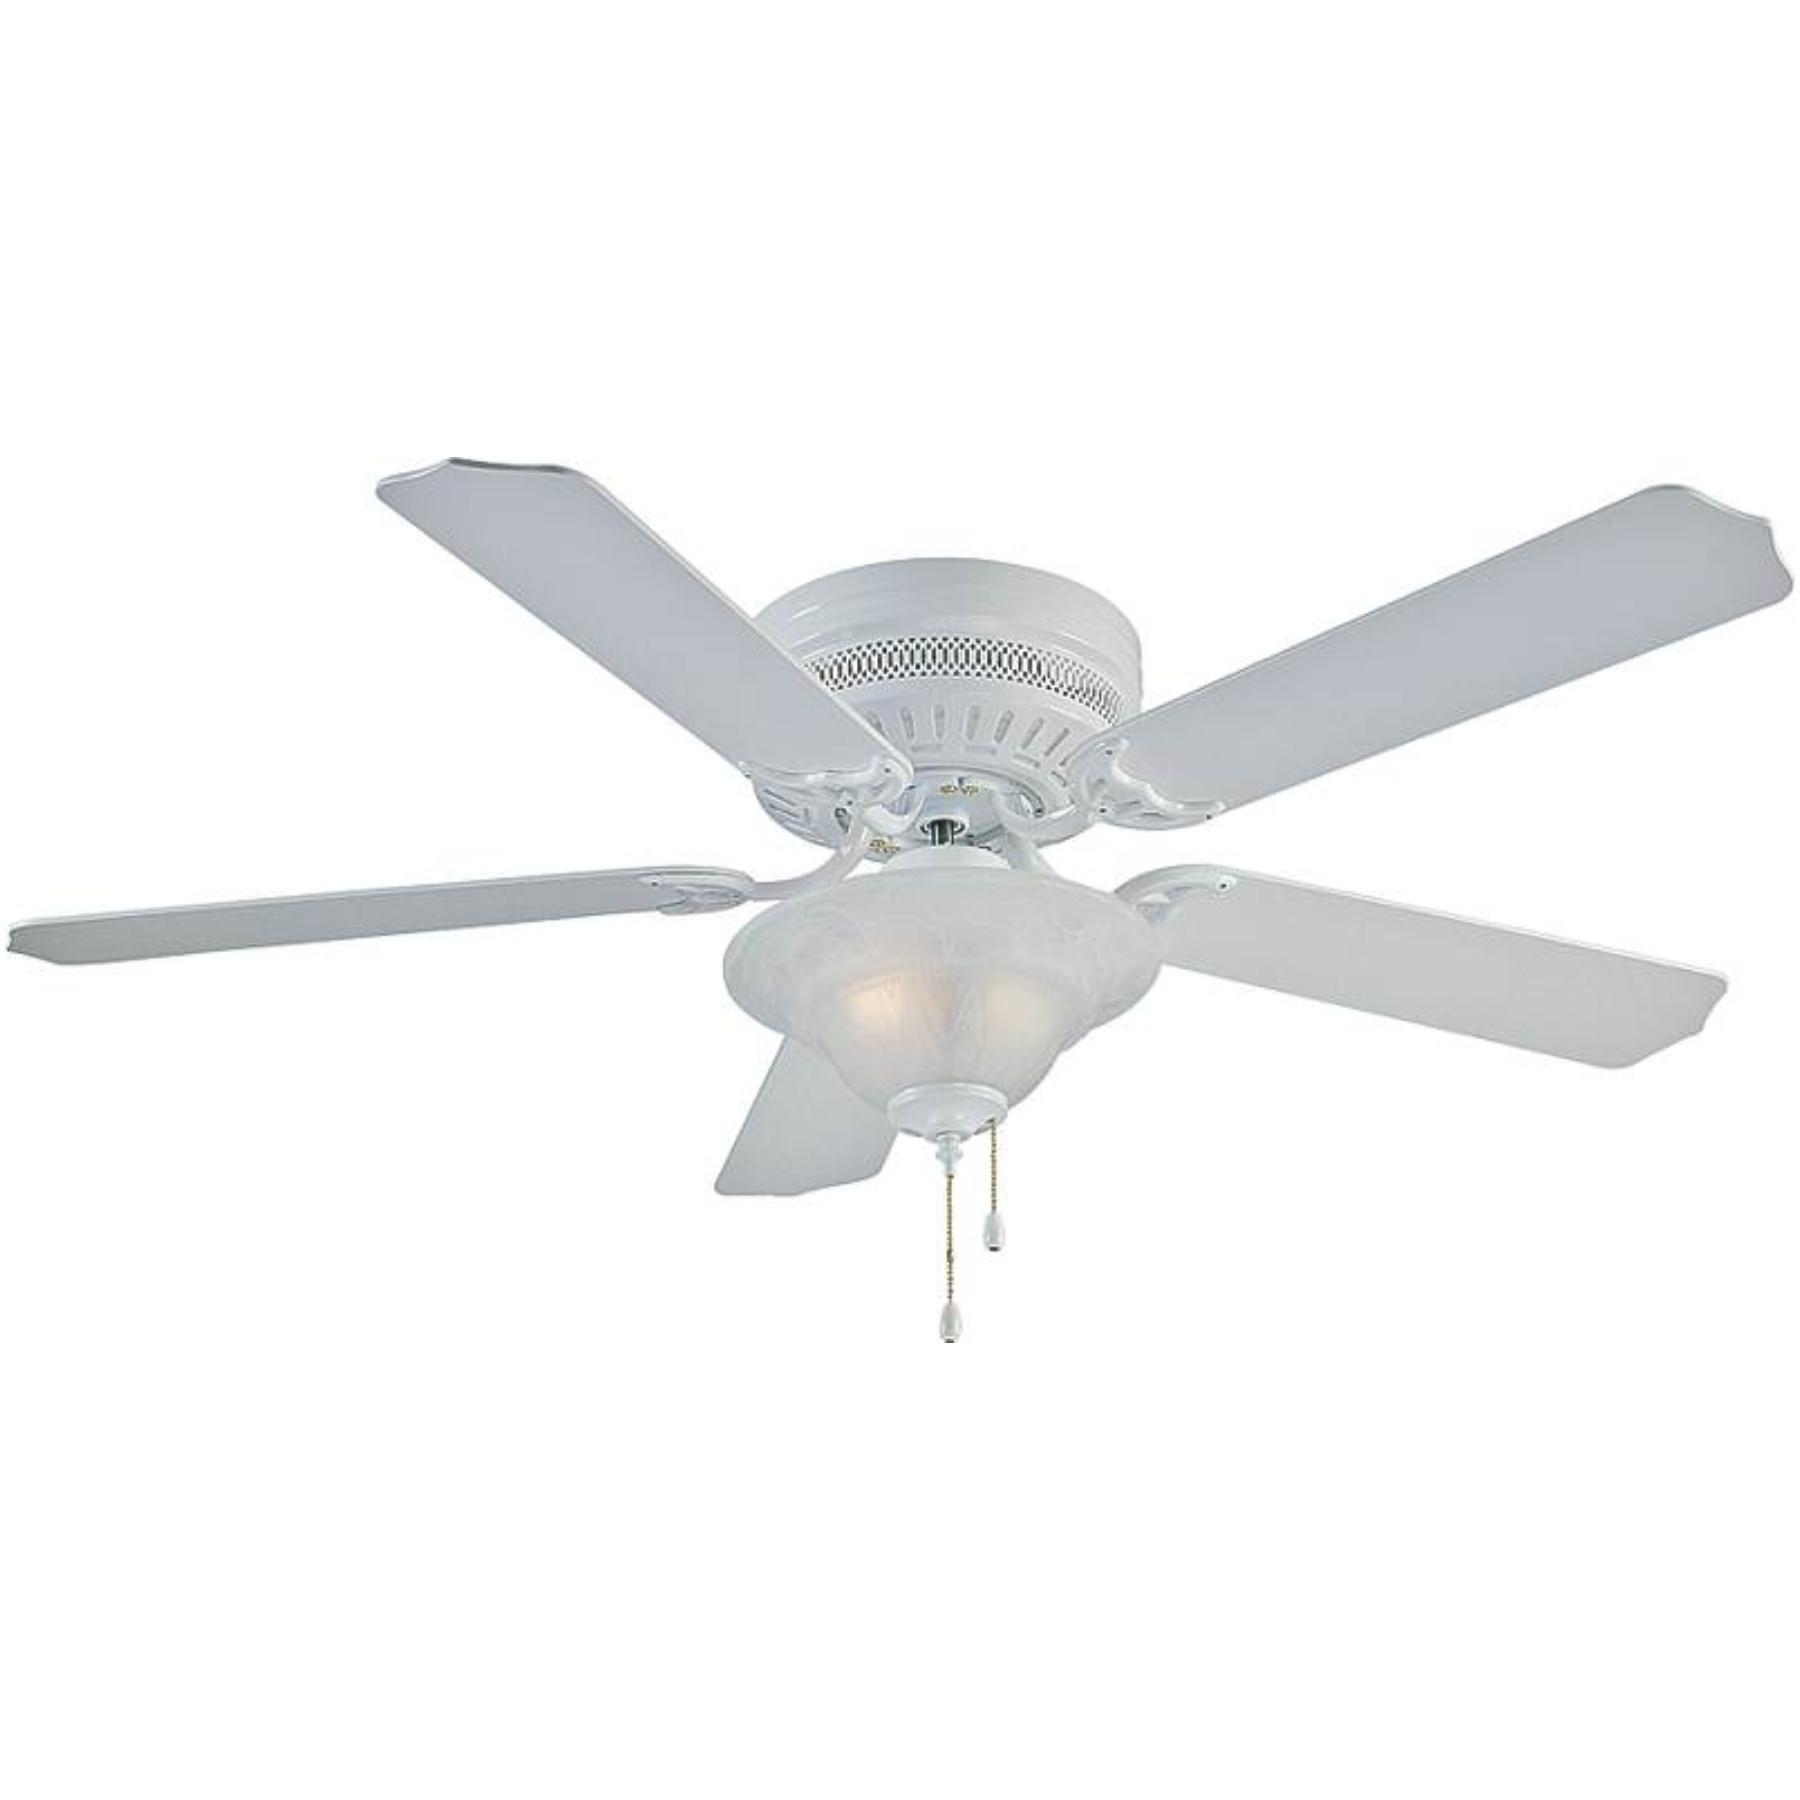 boston harbor ceiling fans photo - 9